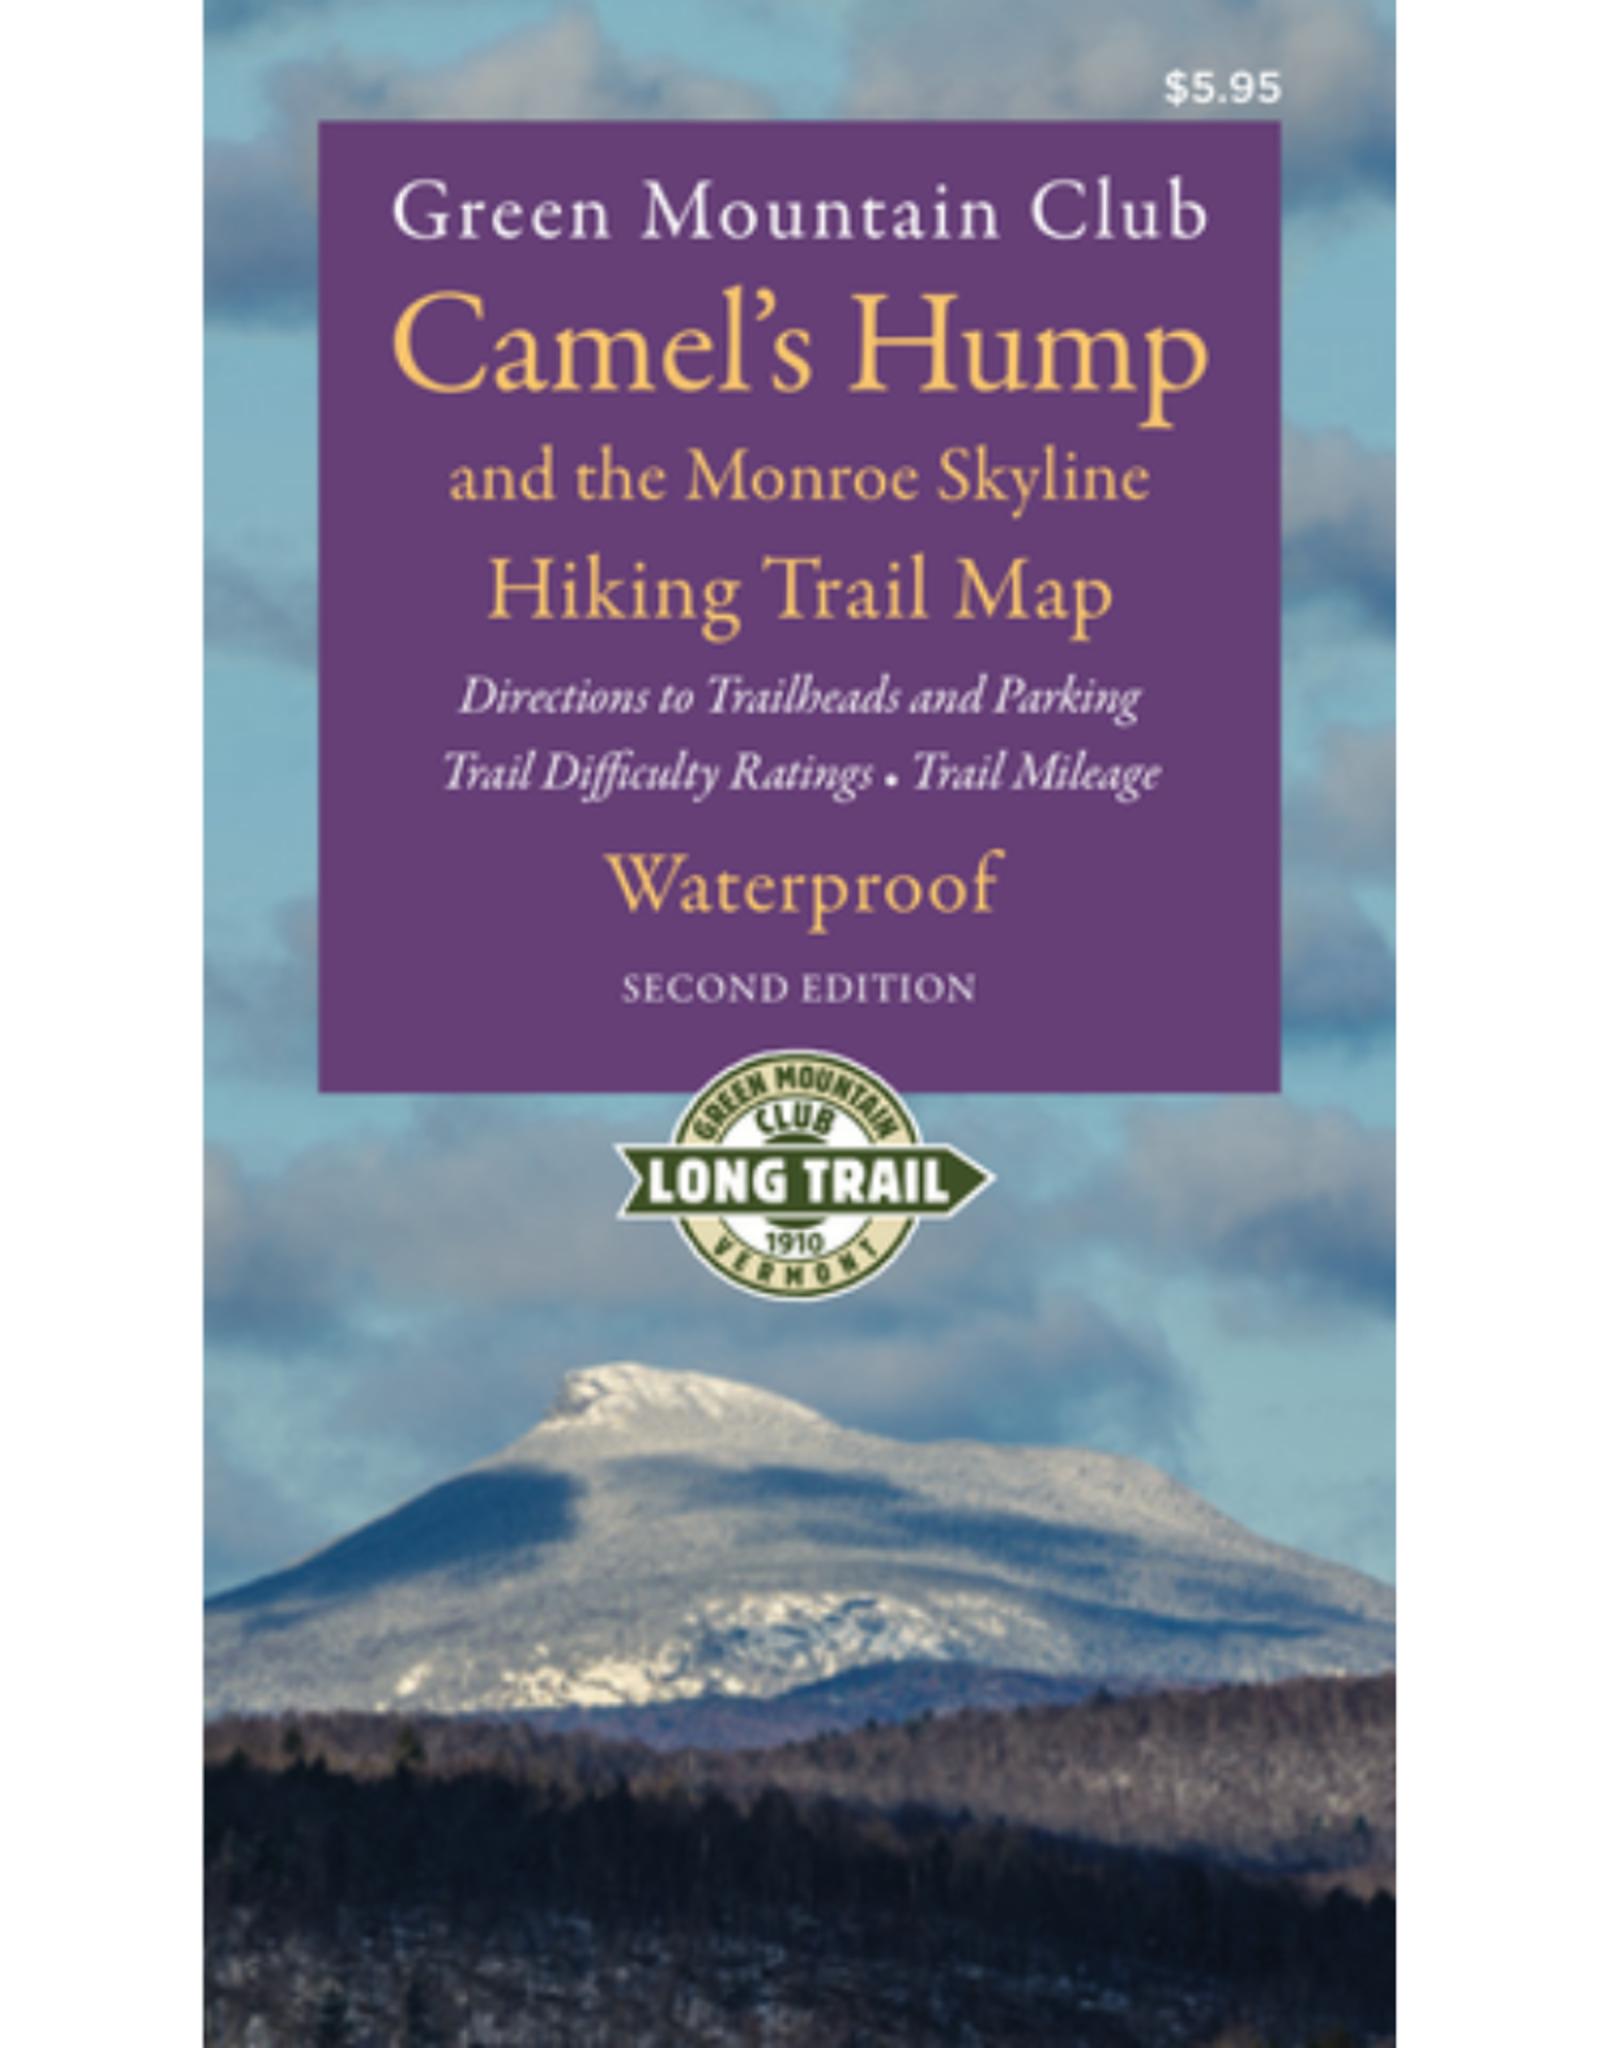 GMC Camel's Hump & the Monroe Skyline Waterproof Hiking Trail Map